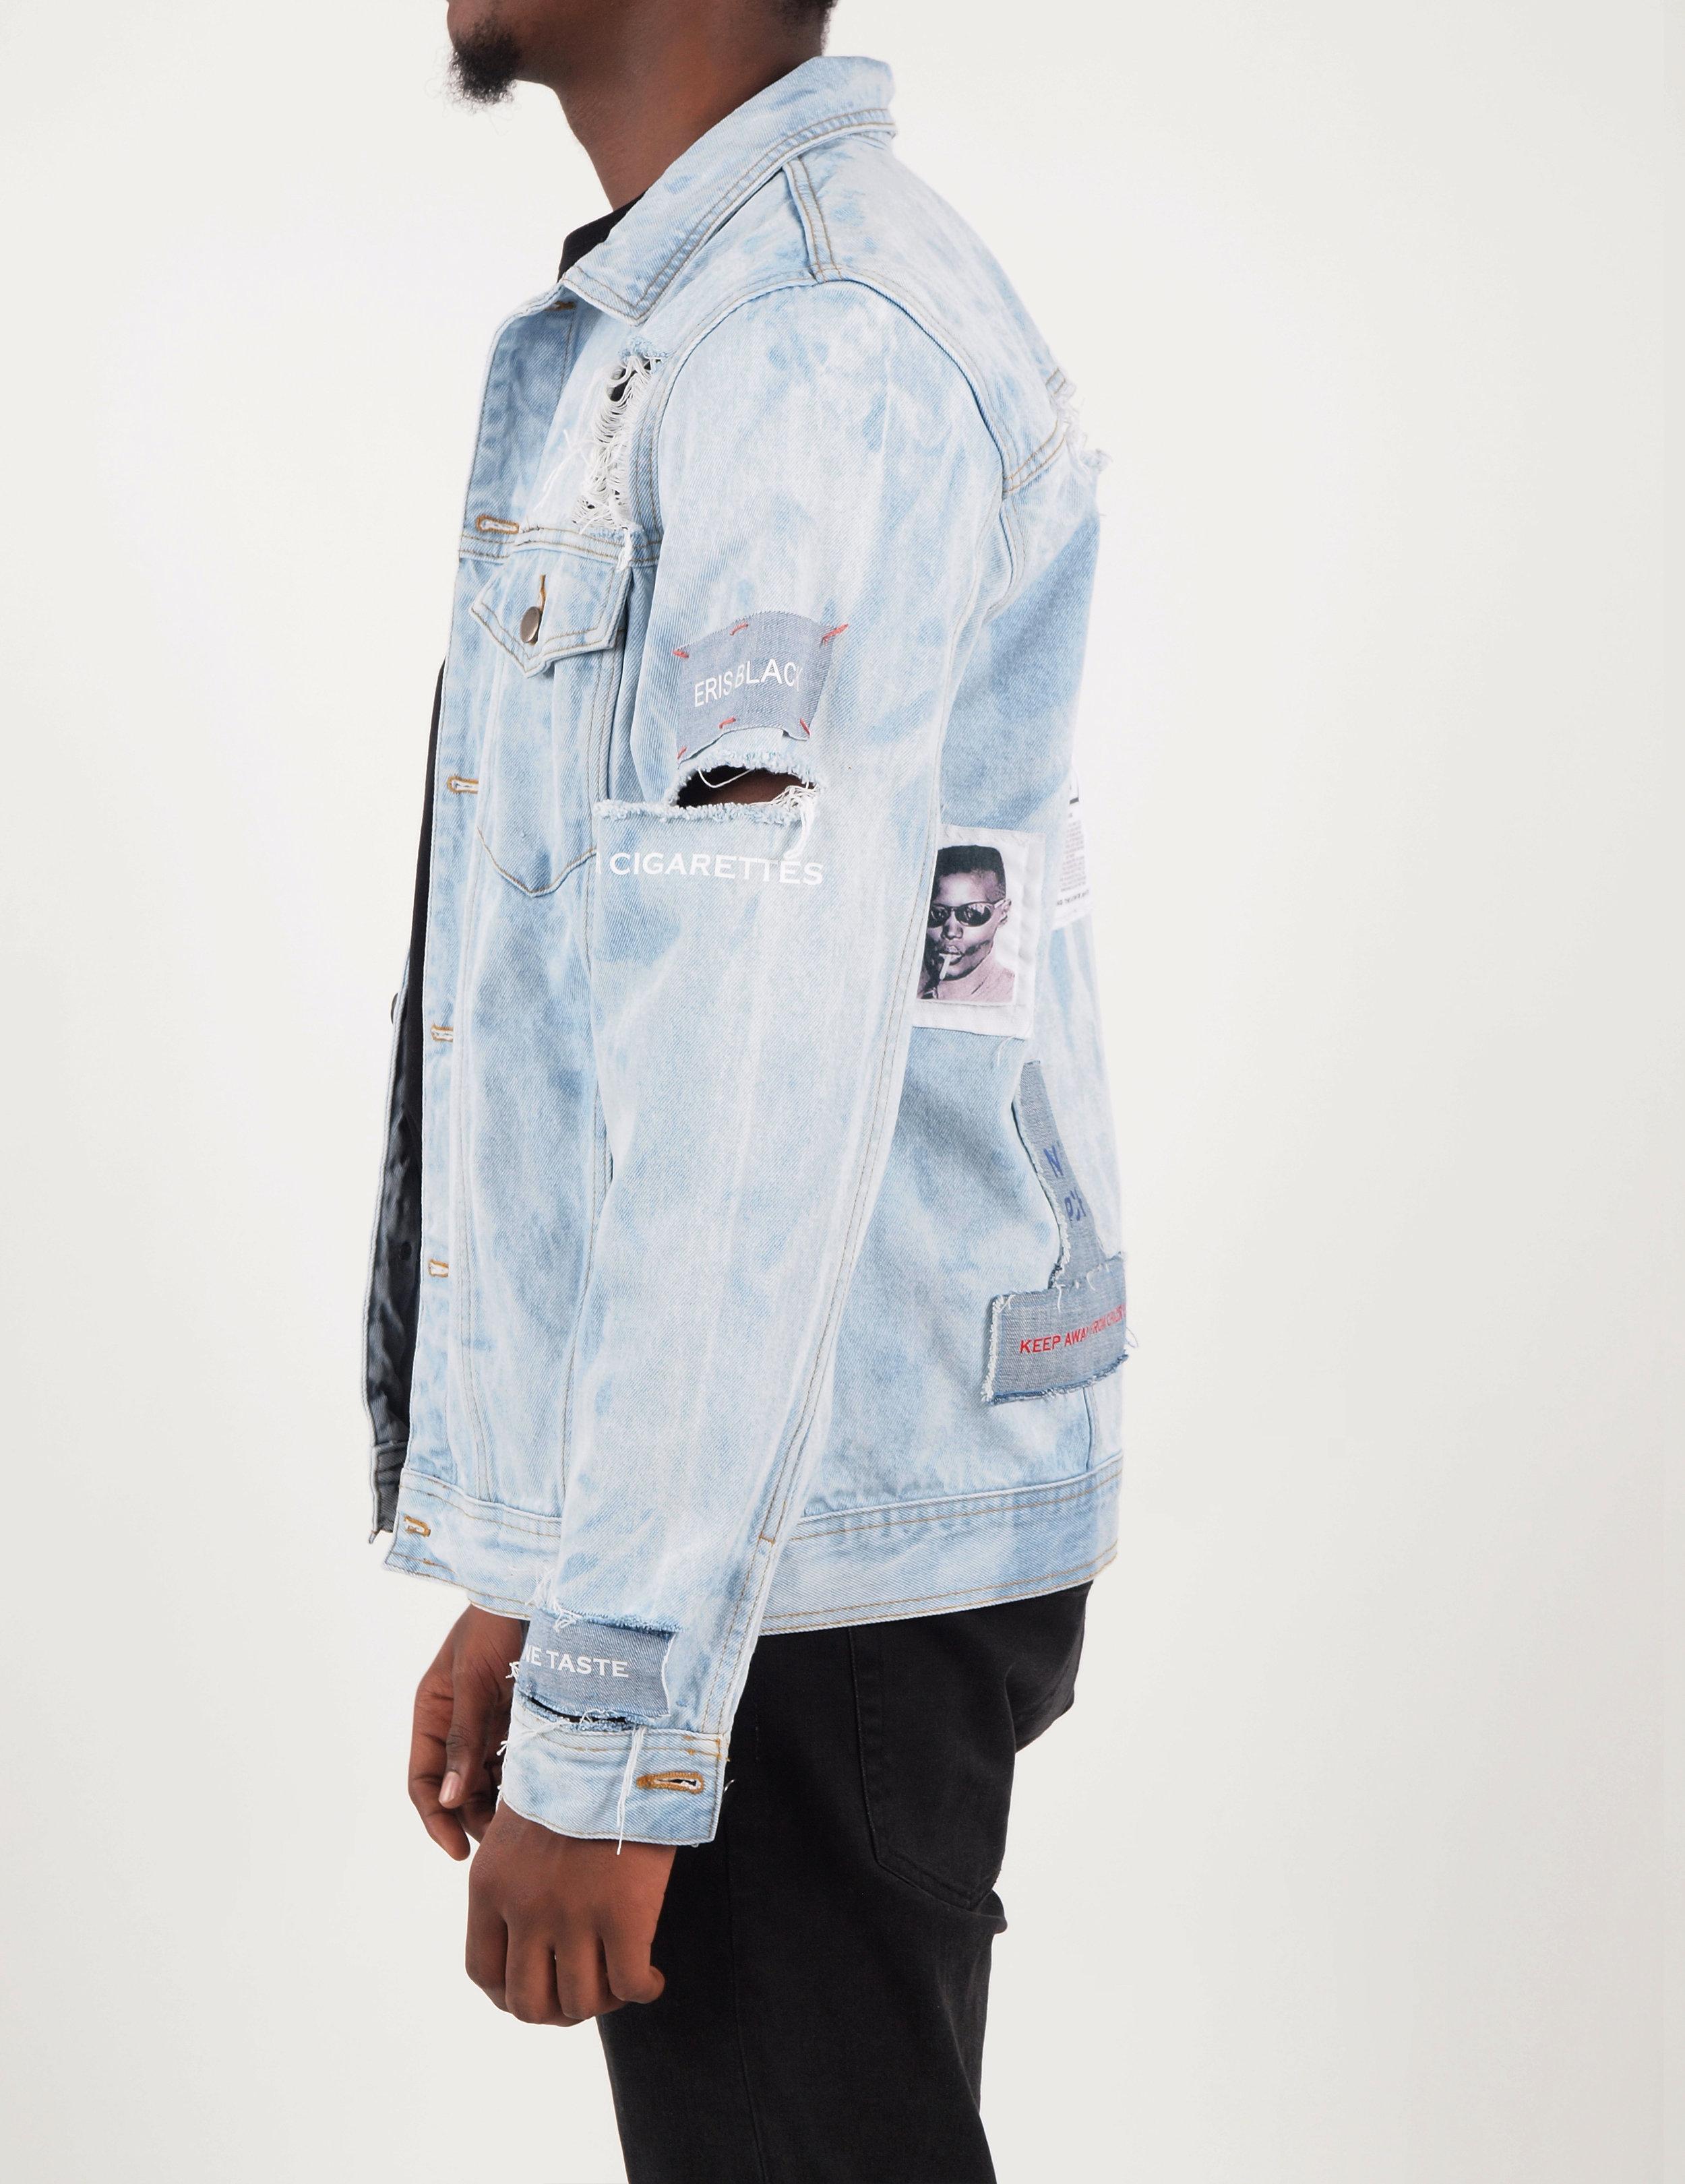 textured blue denim jacket side.jpg